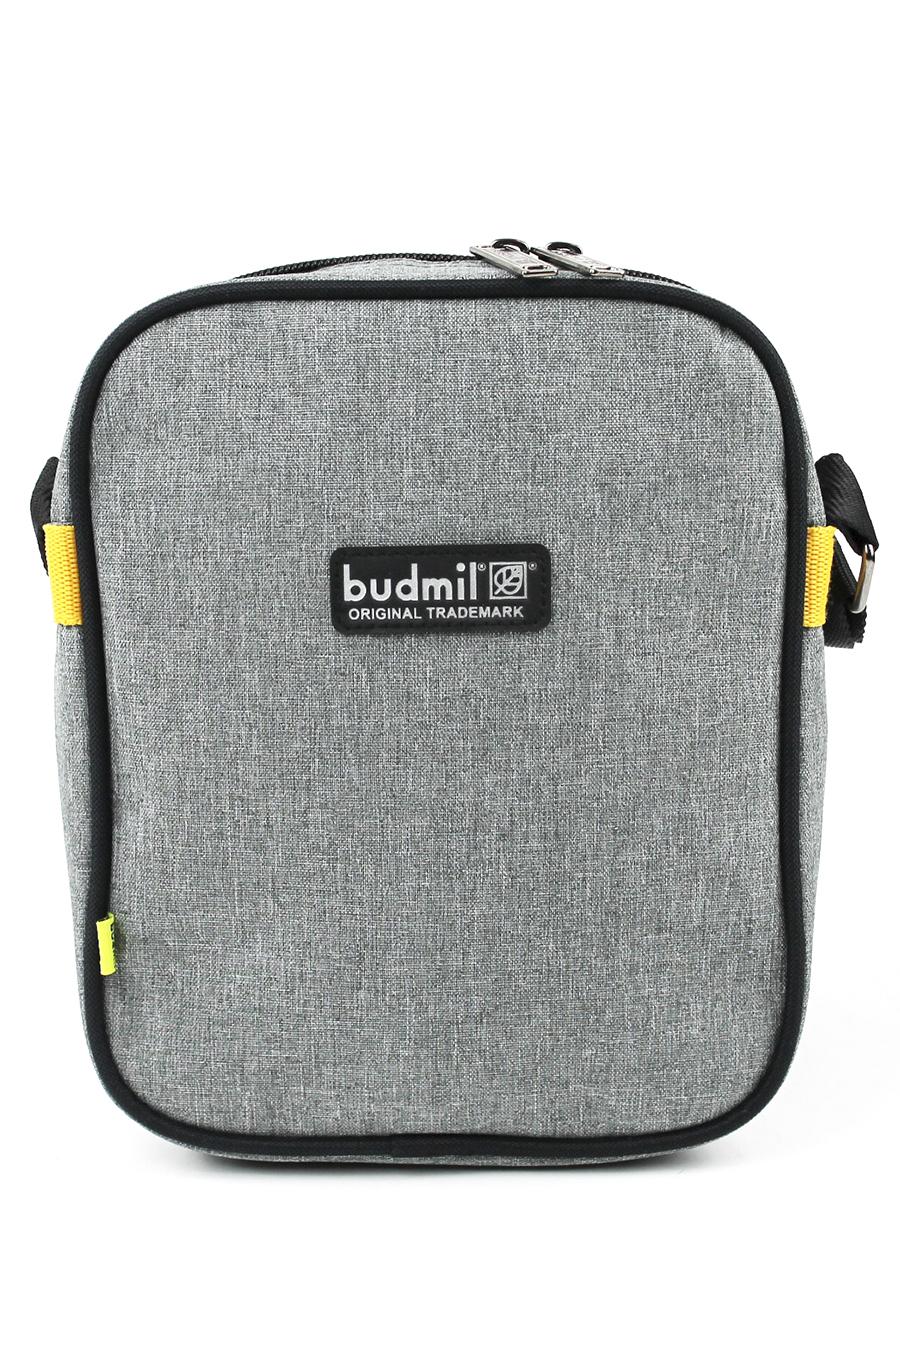 Strapabíró férfi táska | budmil